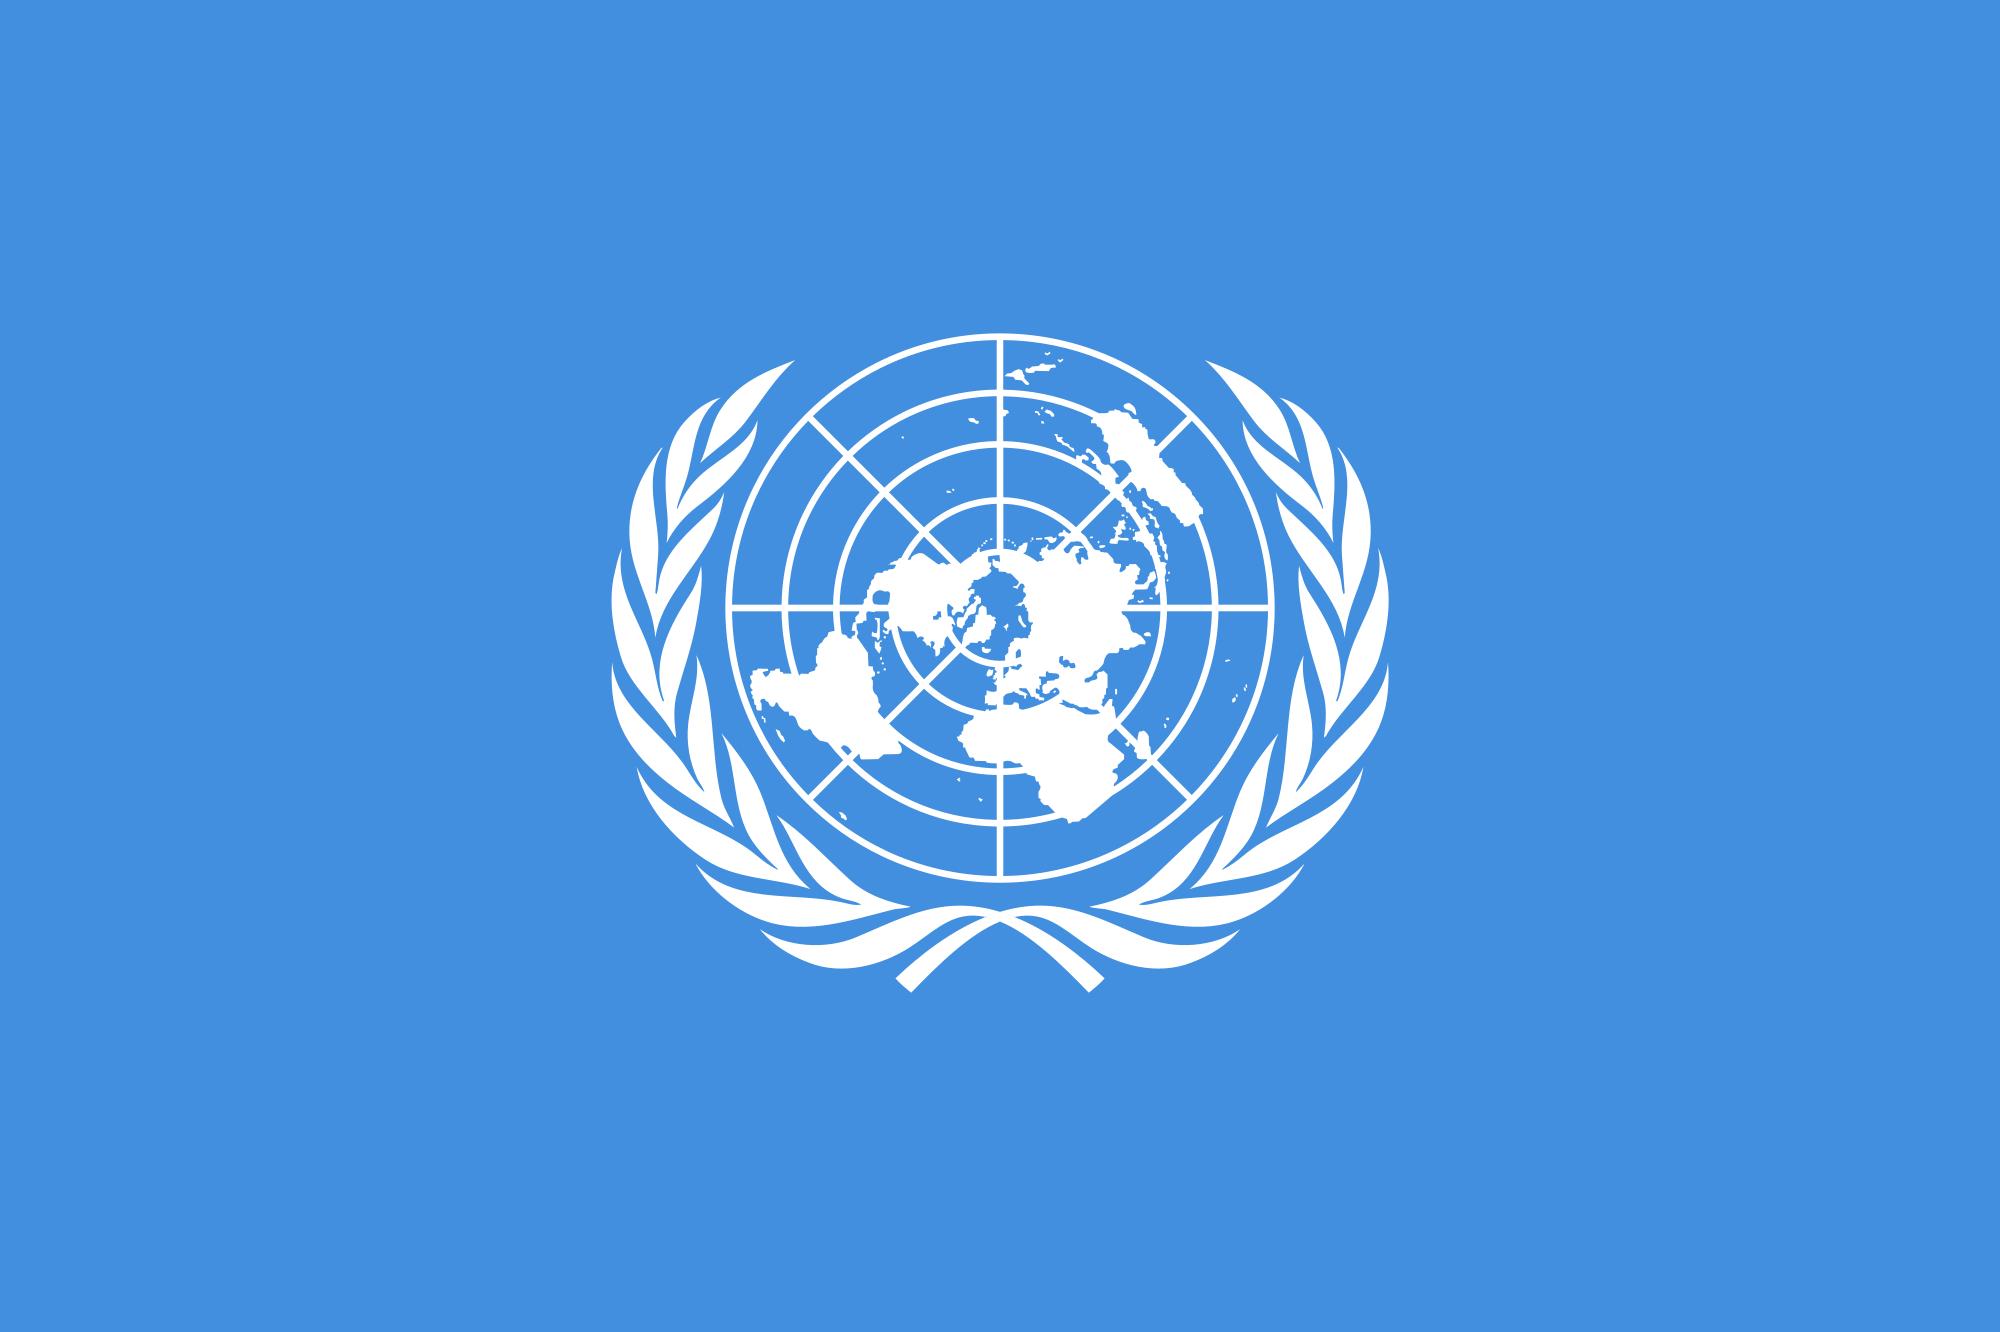 Održan onlajn skup povodom obeležavanja 75 godina UN